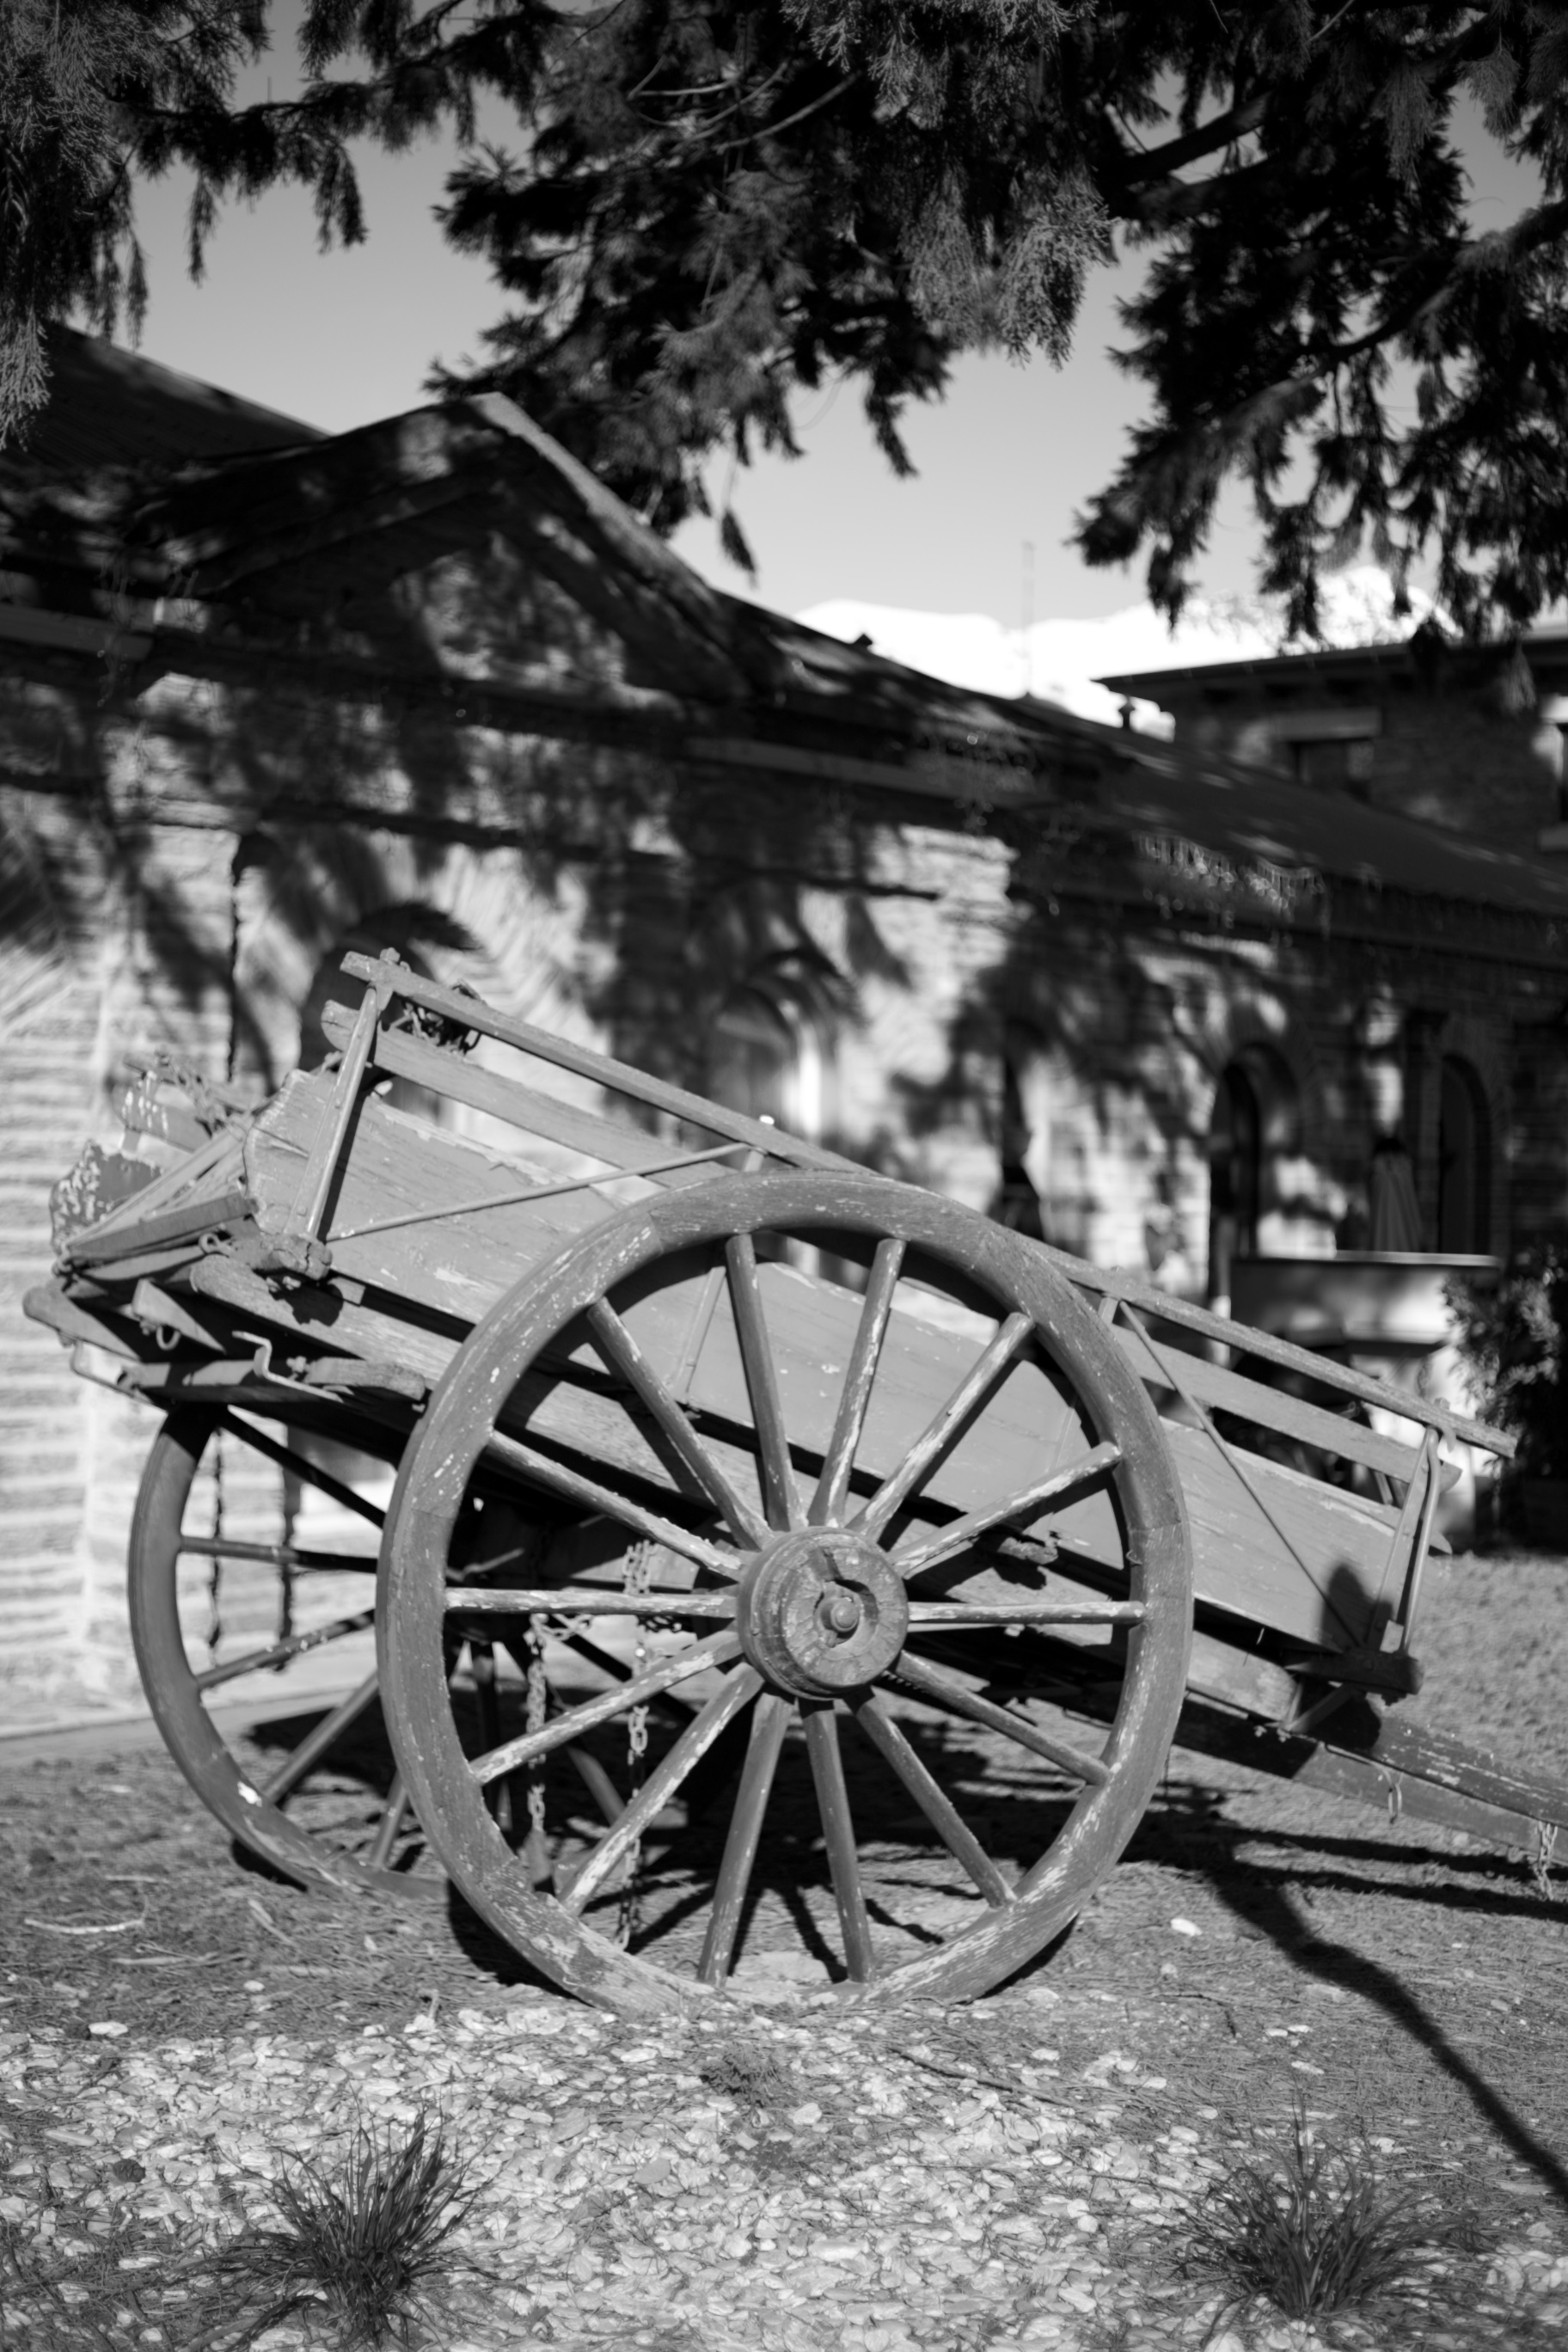 Wagon cart under pine trees.